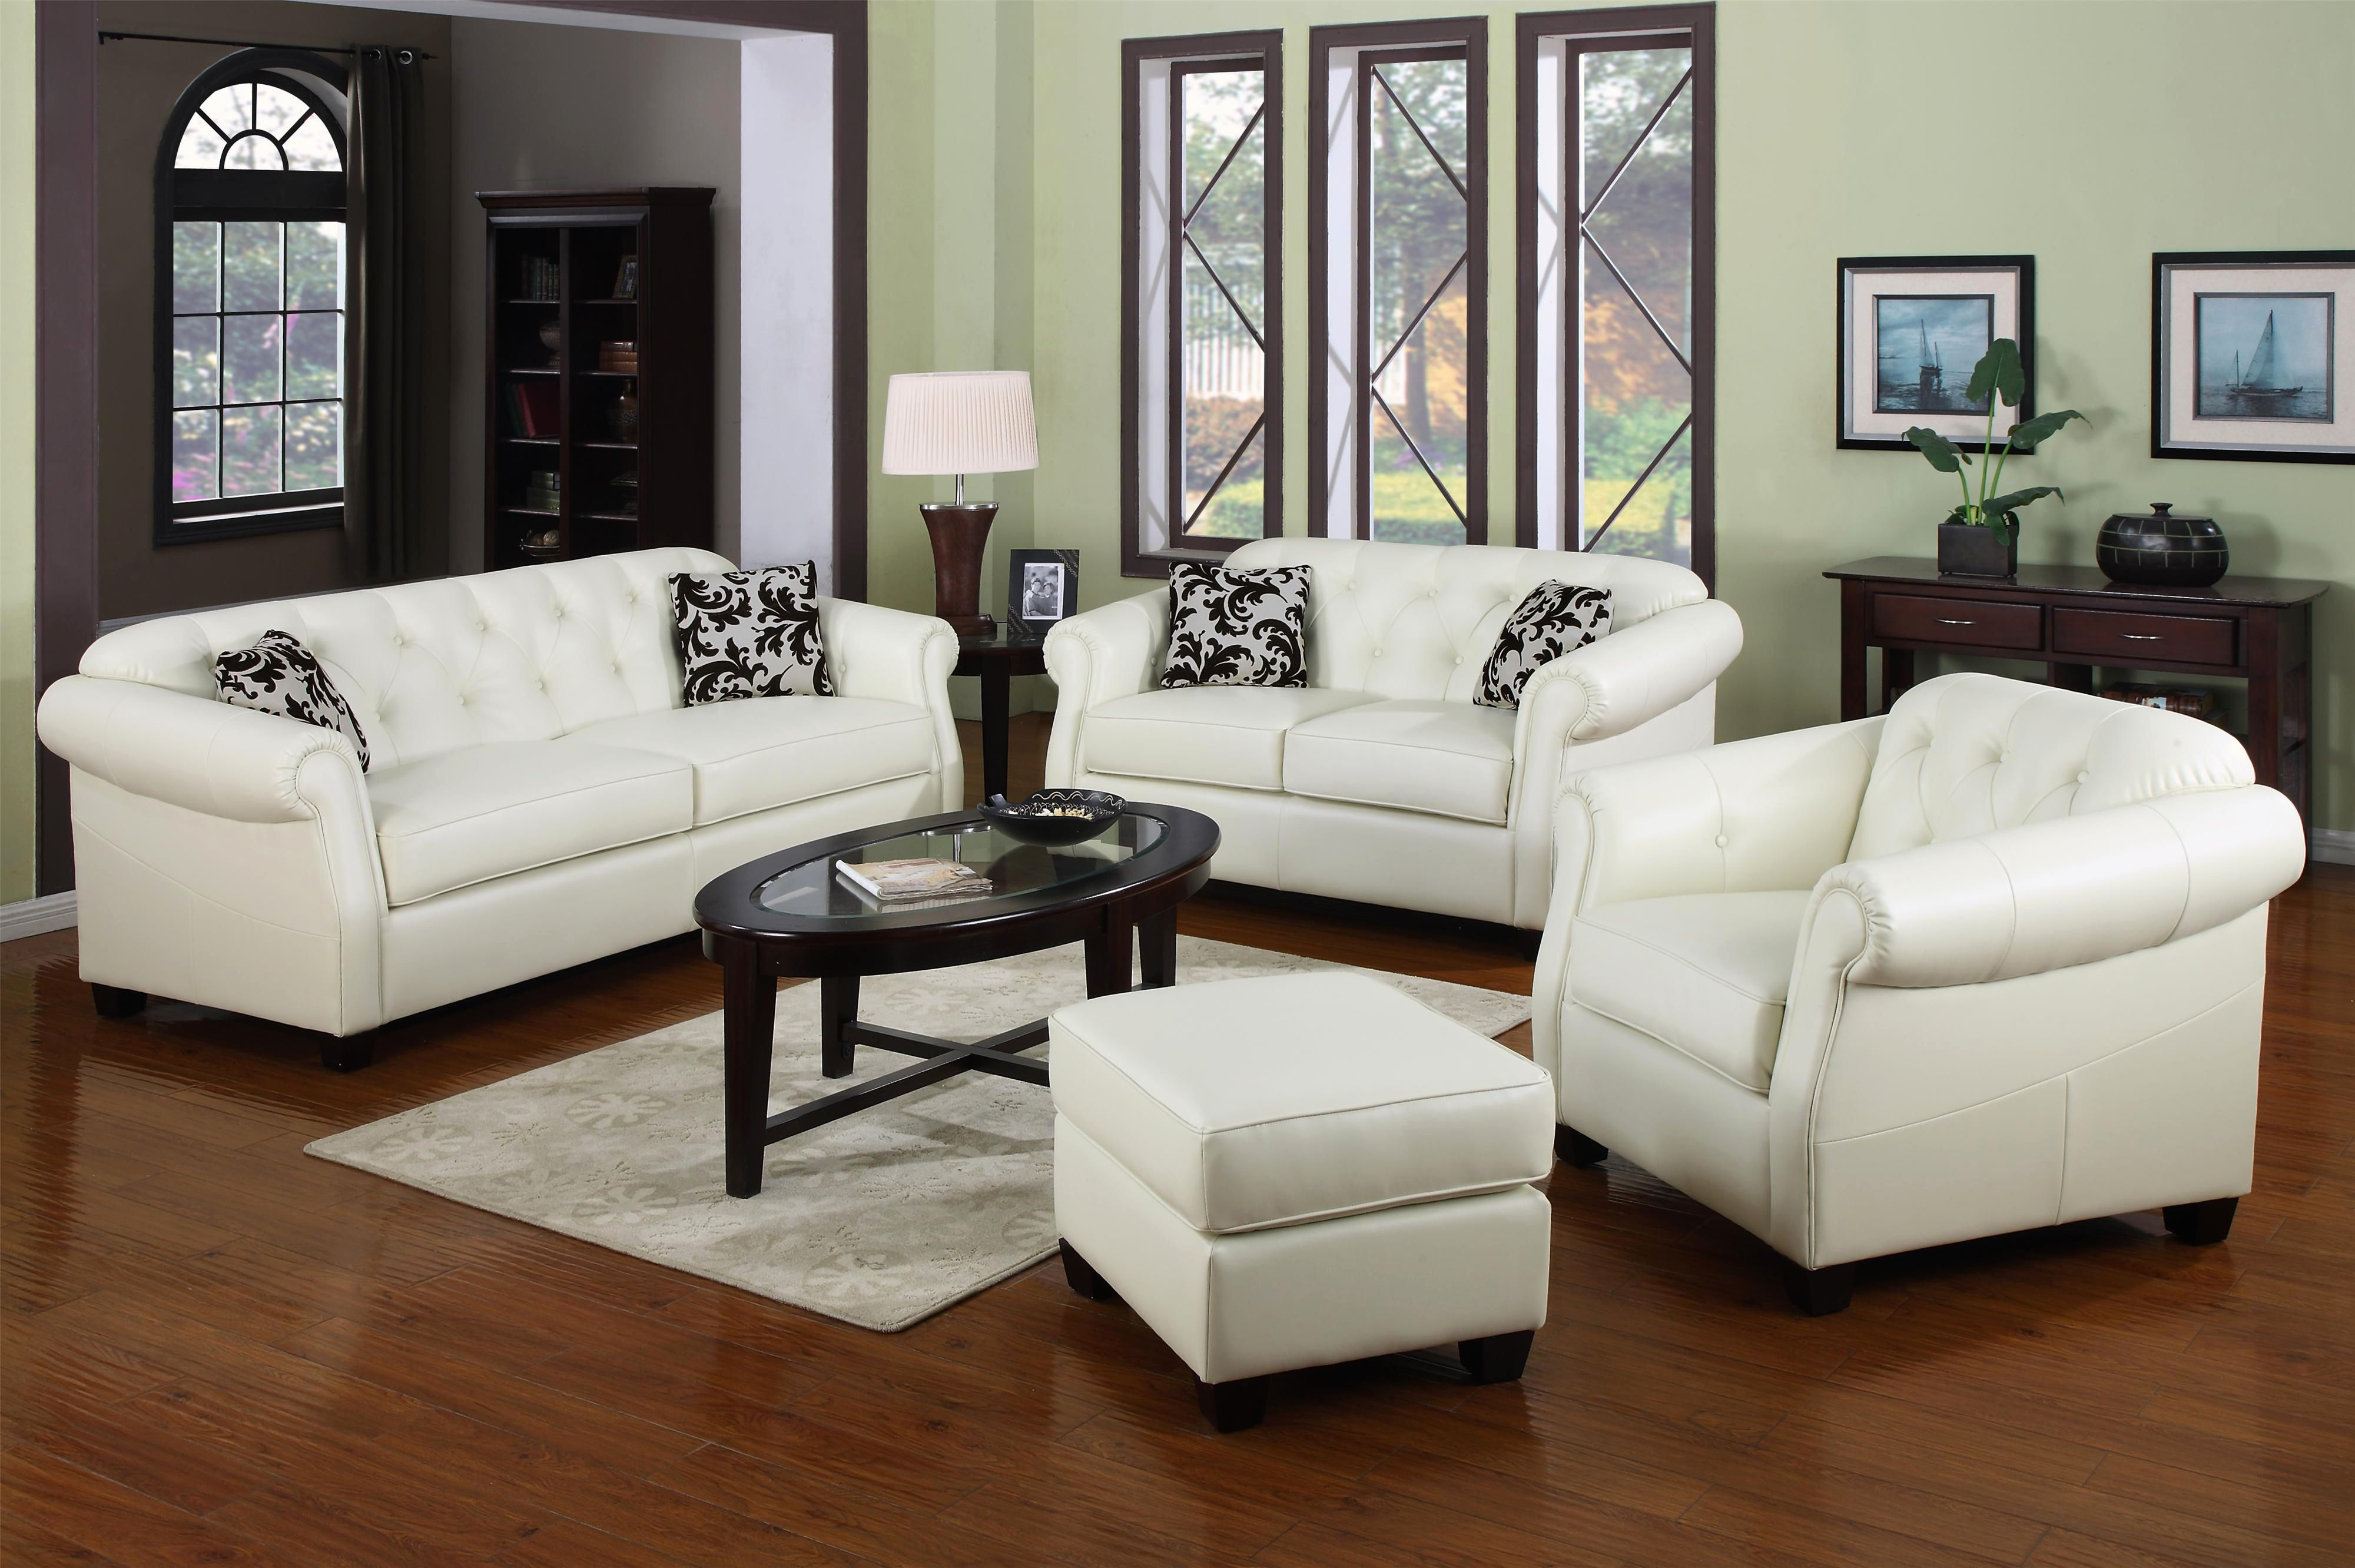 Unique 3 Piece White Leather sofa Set